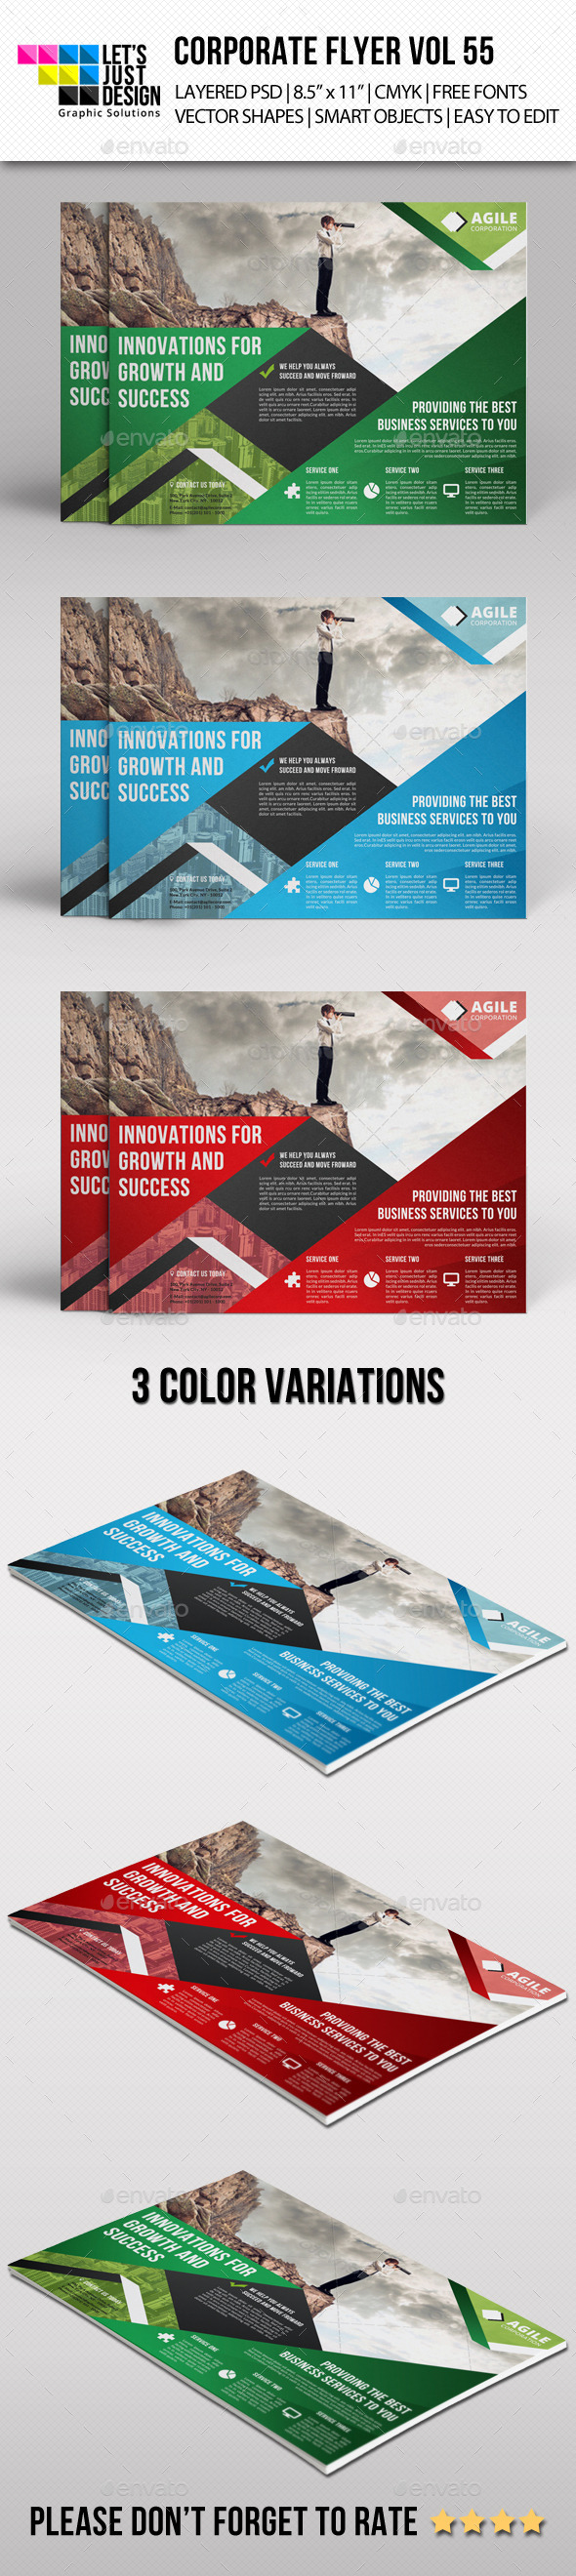 GraphicRiver Corporate Flyer Template Vol 55 11548160